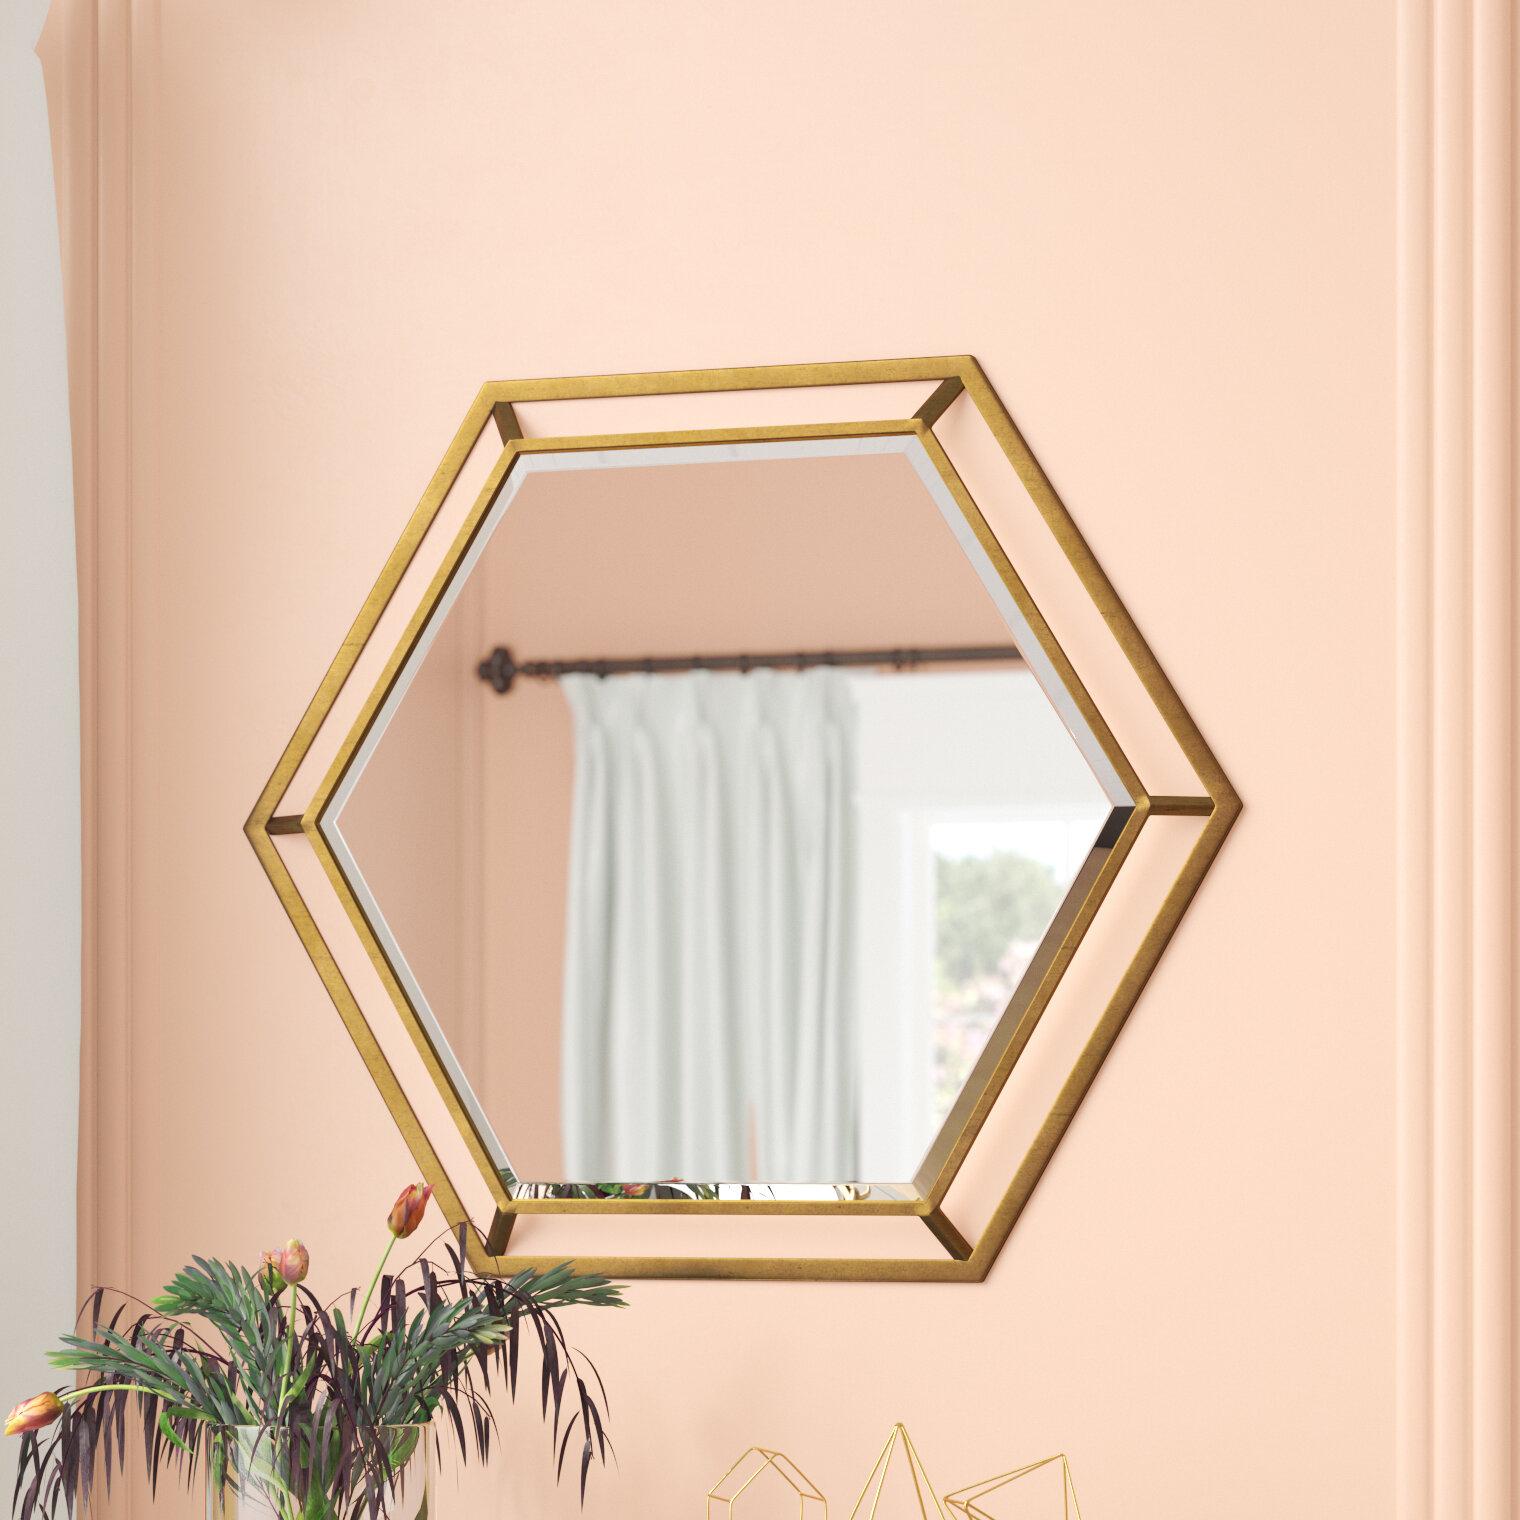 Kelston Mills Modern & Contemporary Beveled Accent Mirror With Regard To Willacoochee Traditional Beveled Accent Mirrors (View 13 of 20)